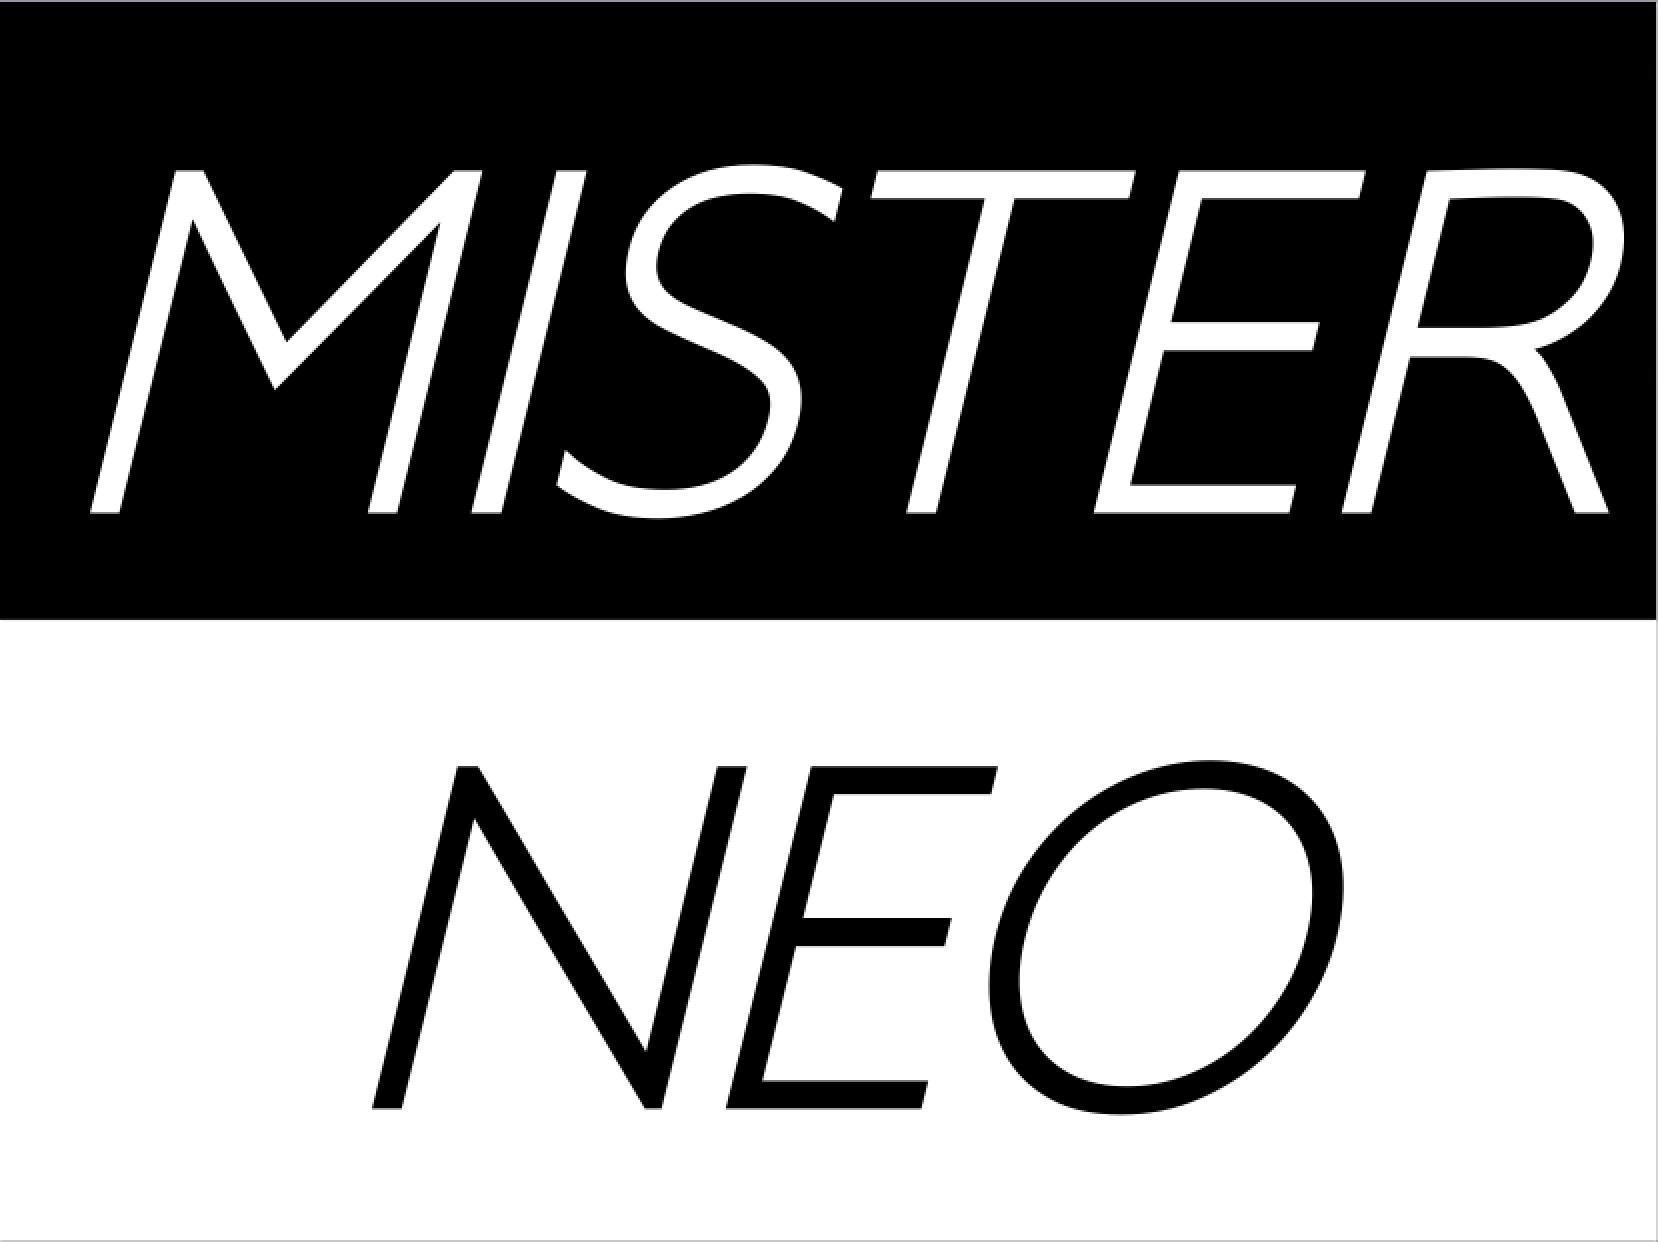 Junggesellenabschied Berlin mit Mister Neo